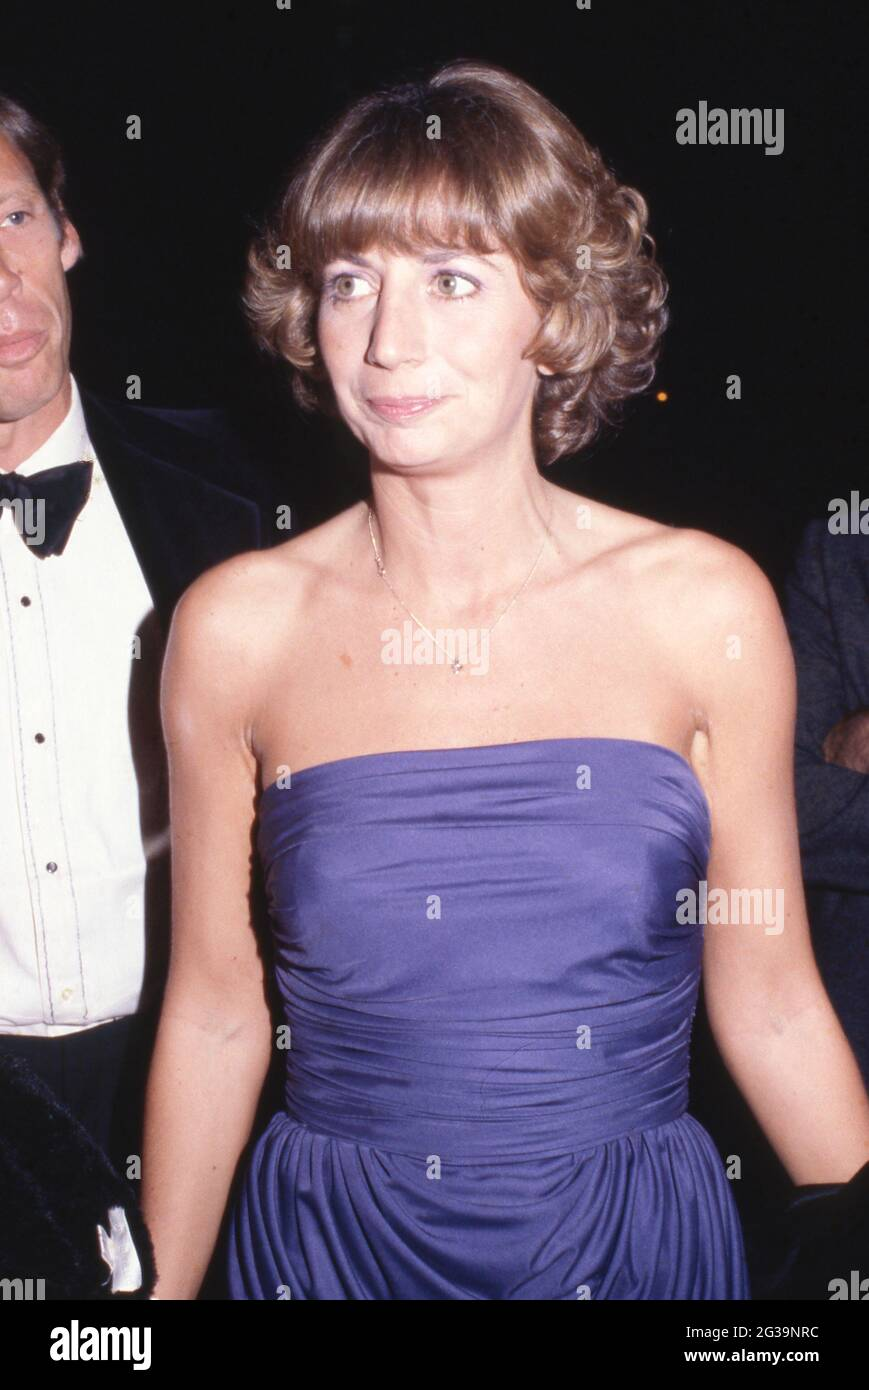 Penny Marshall Circa années 80 crédit: Ralph Dominguez/MediaPunch Banque D'Images